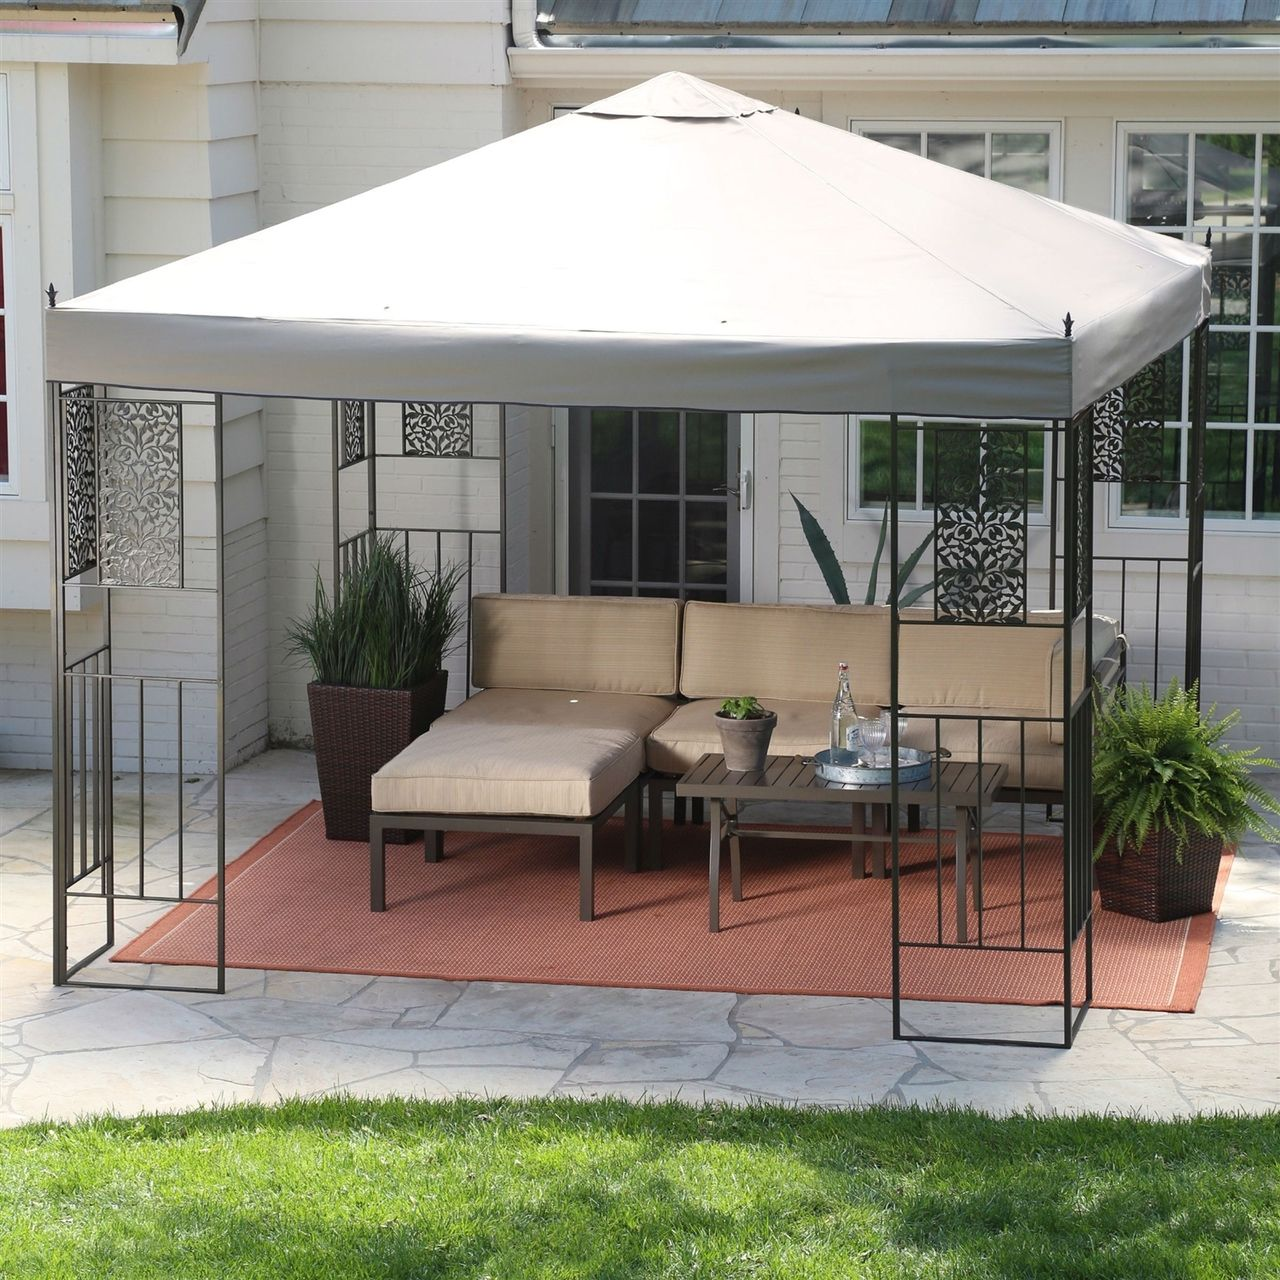 10 x 10-ft Backyard Patio Garden Gazebo, Steel Frame, Vented Canopy